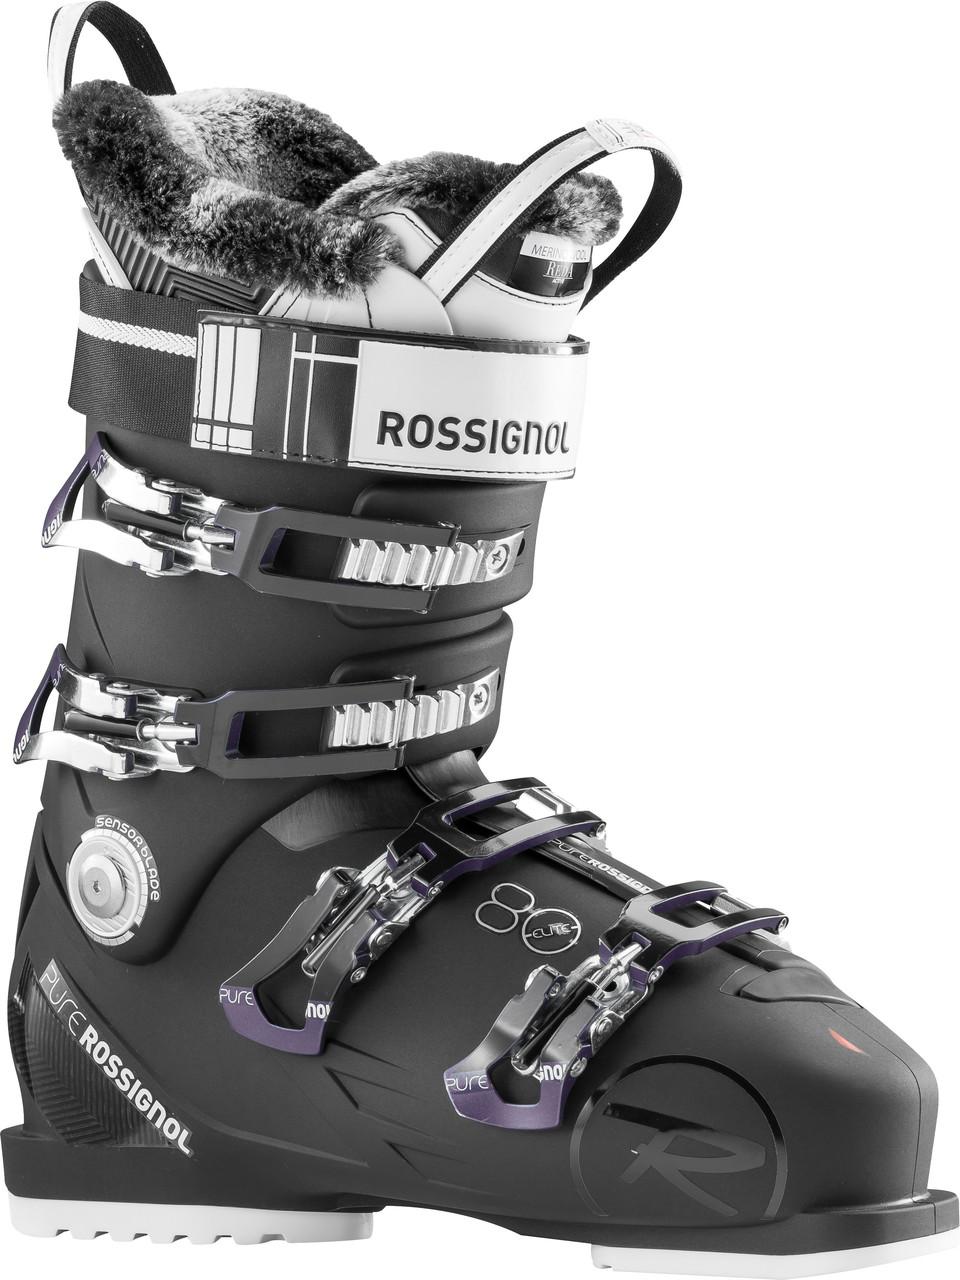 Горнолыжные ботинки женские Rossignol PURE ELITE 80 (MD)